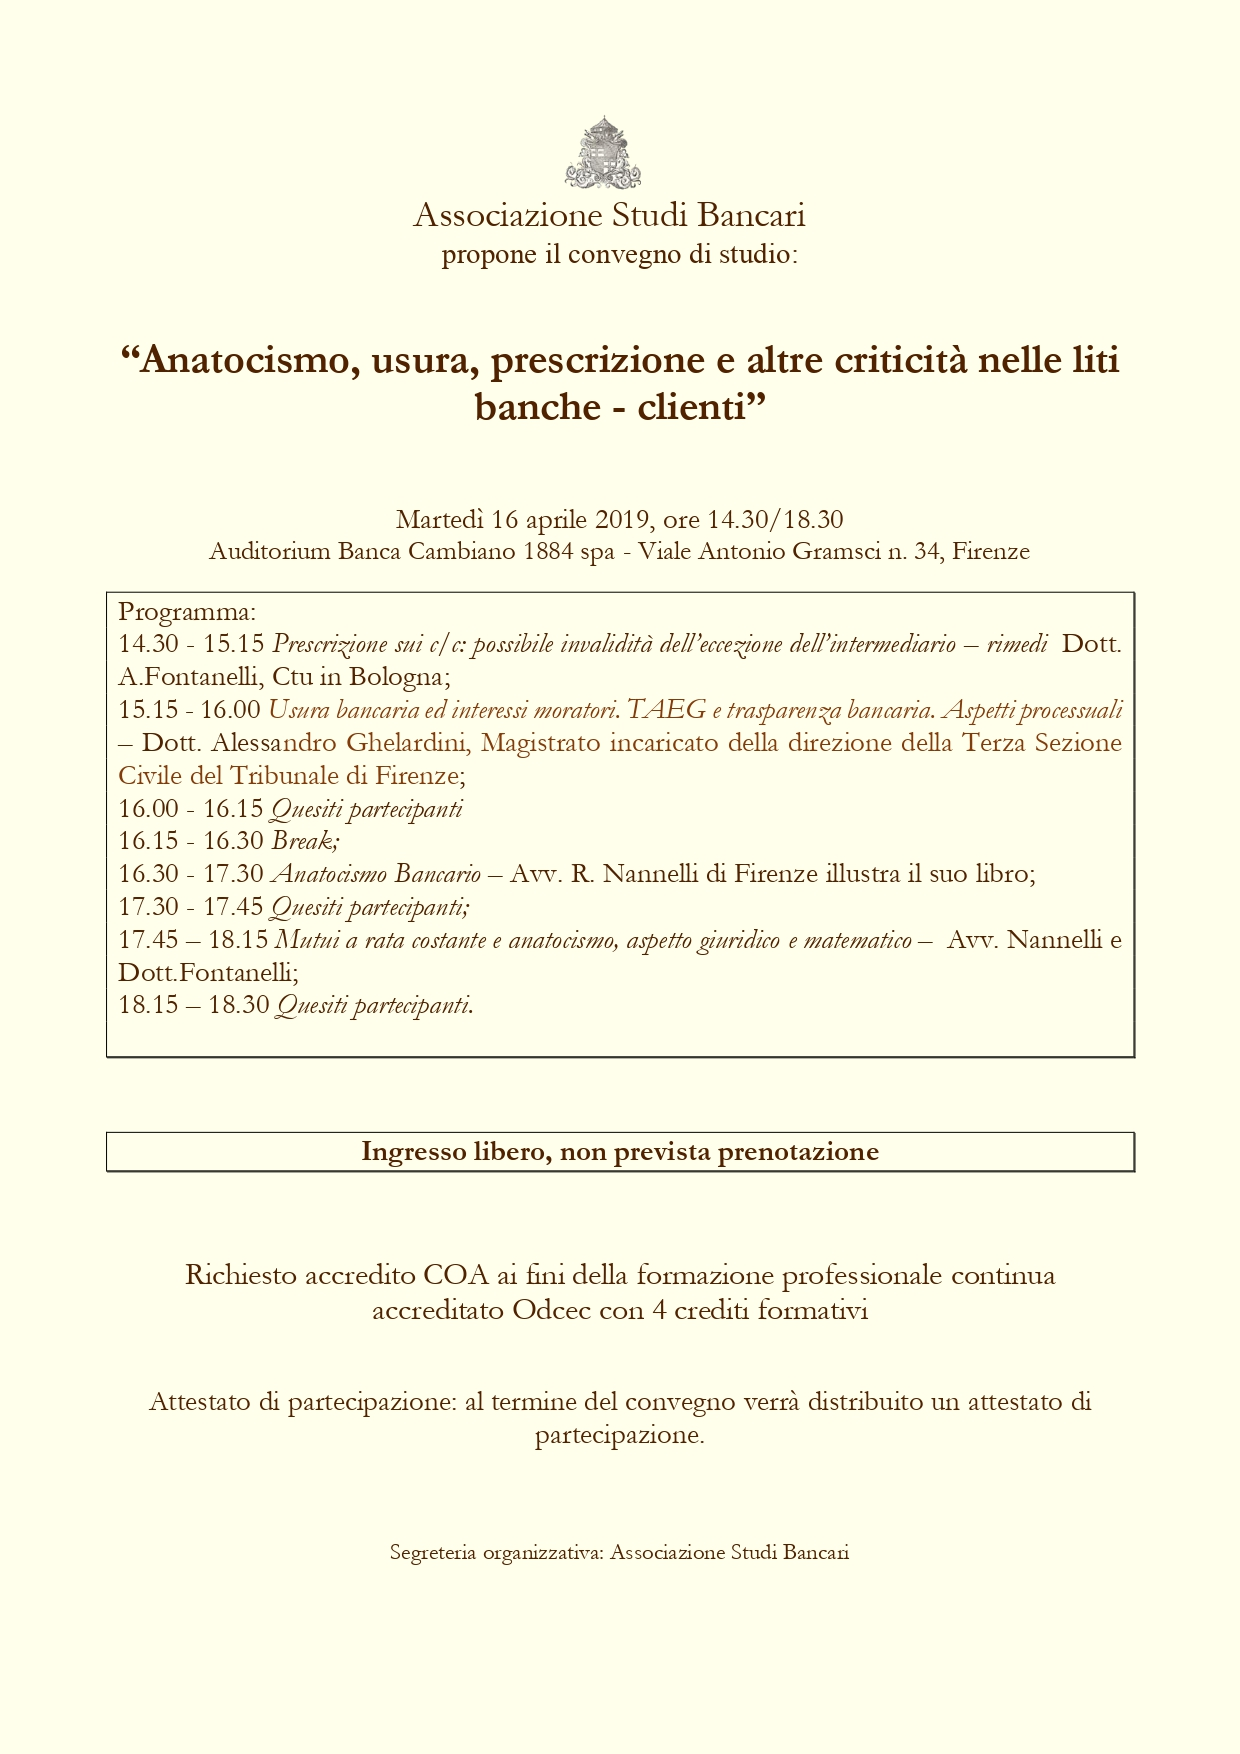 Firenze - Martedì 16 aprile 2019, ore 14.30/18.30